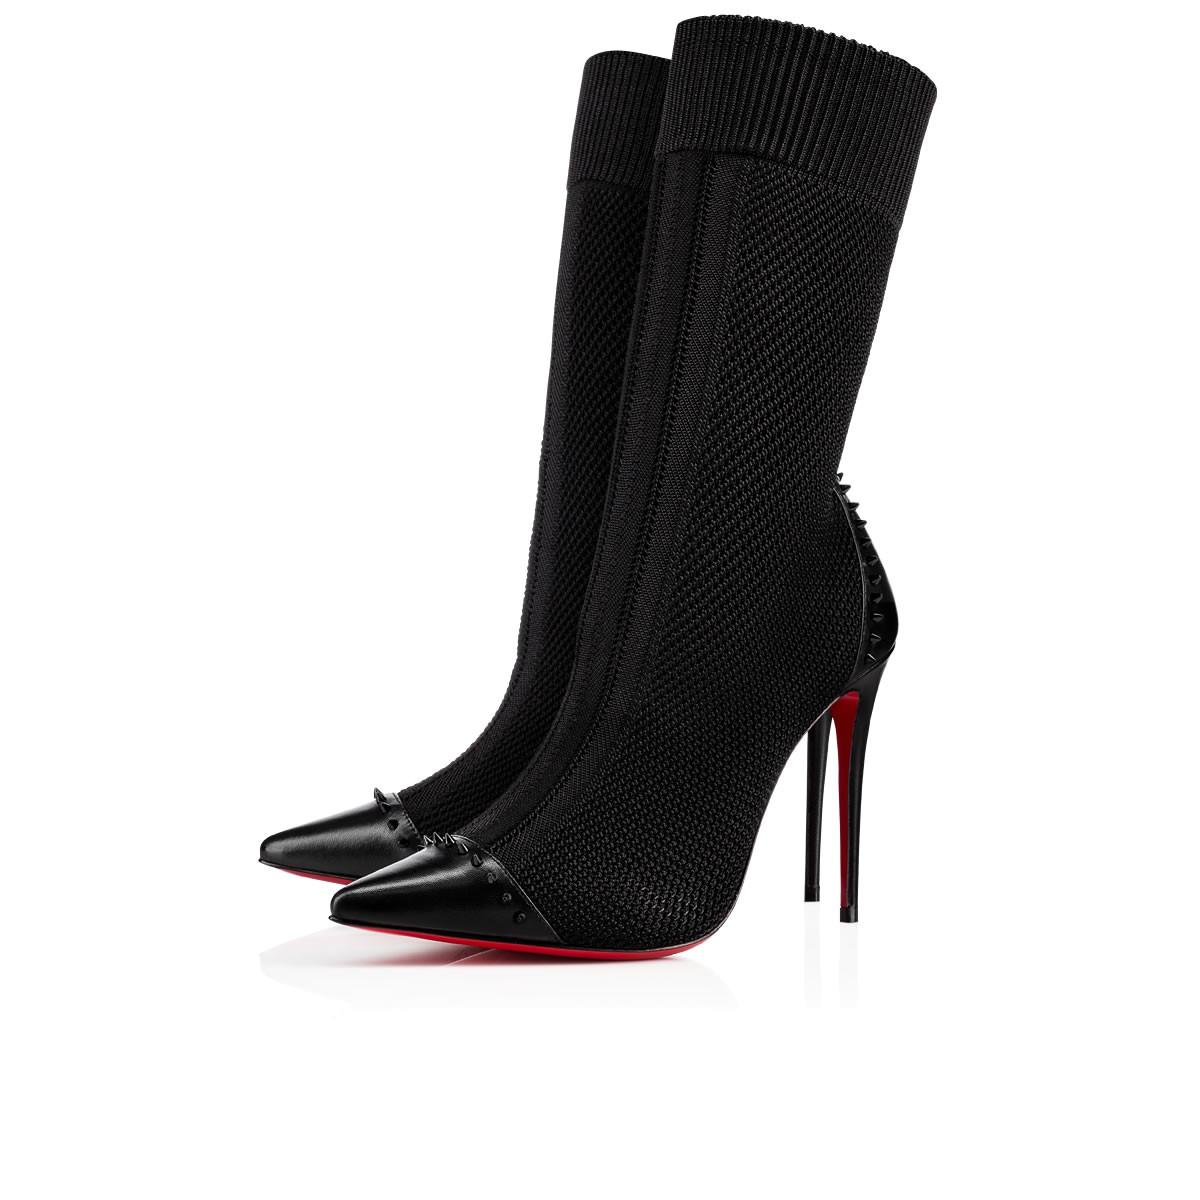 Christian Louboutin Dovi Dova 100 Studded Leather-trimmed Stretch-knit Sock Boots In Black